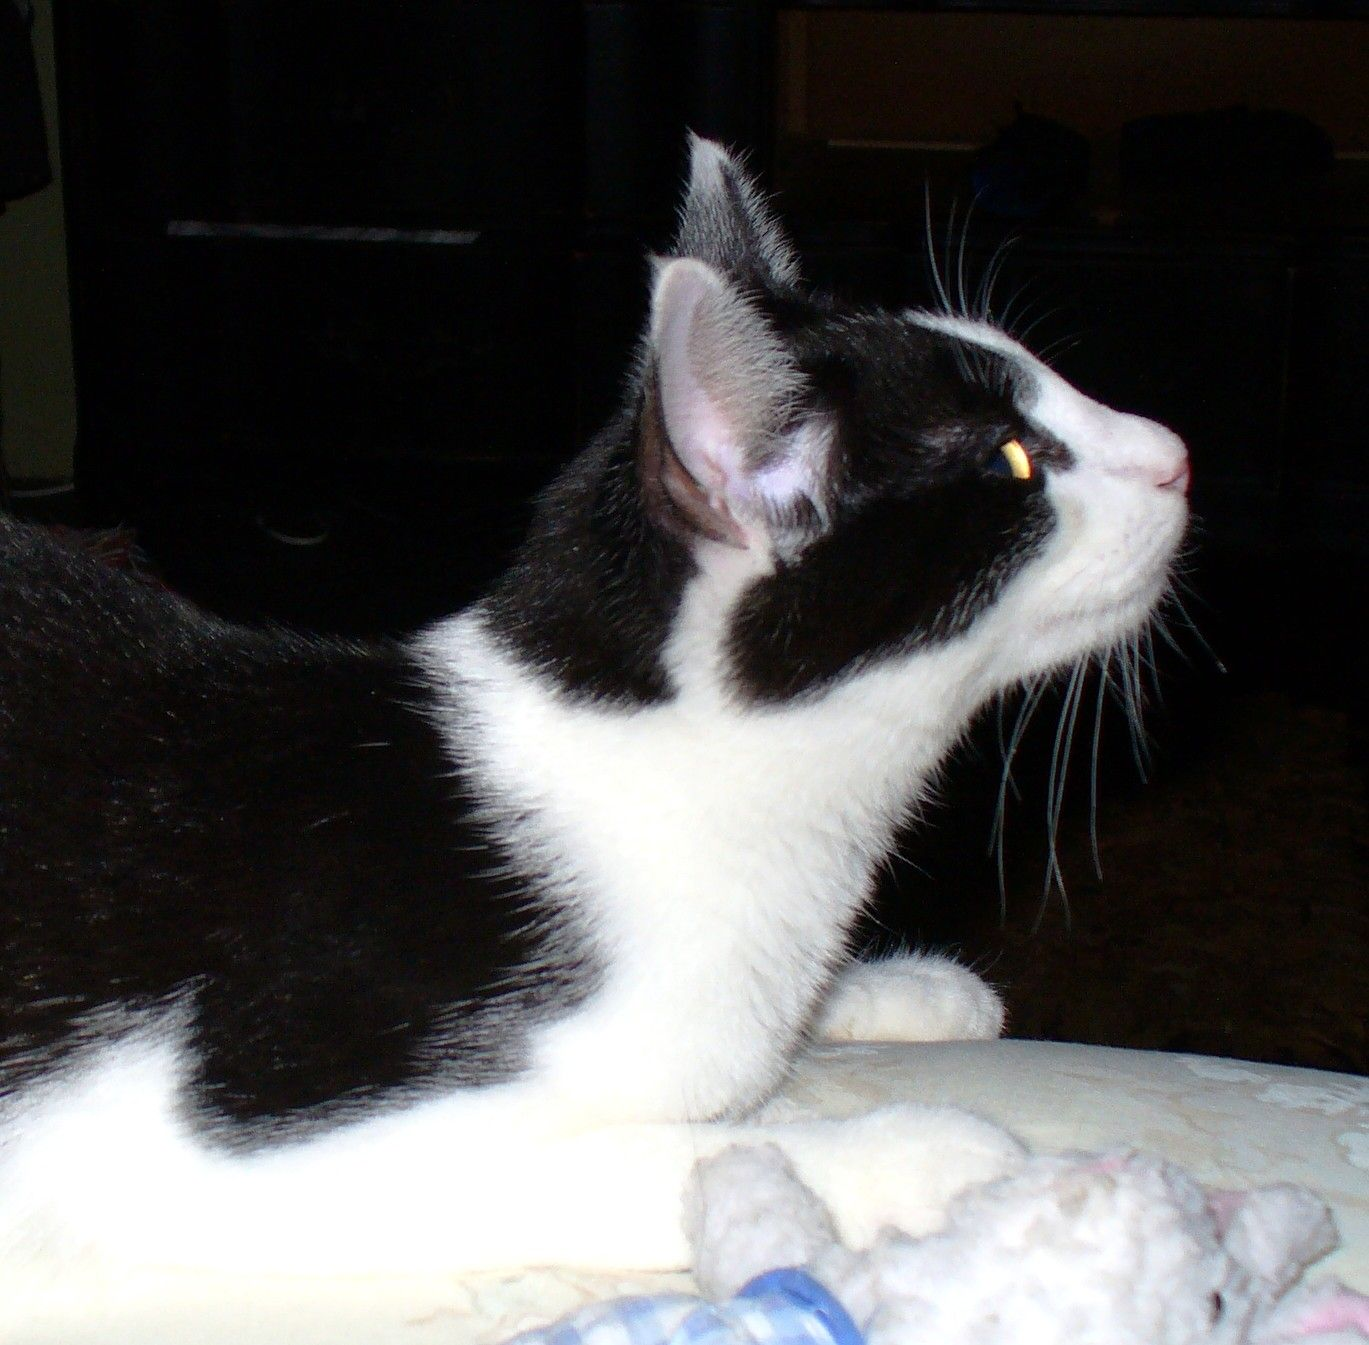 Elvis - a sociopathic kitteh